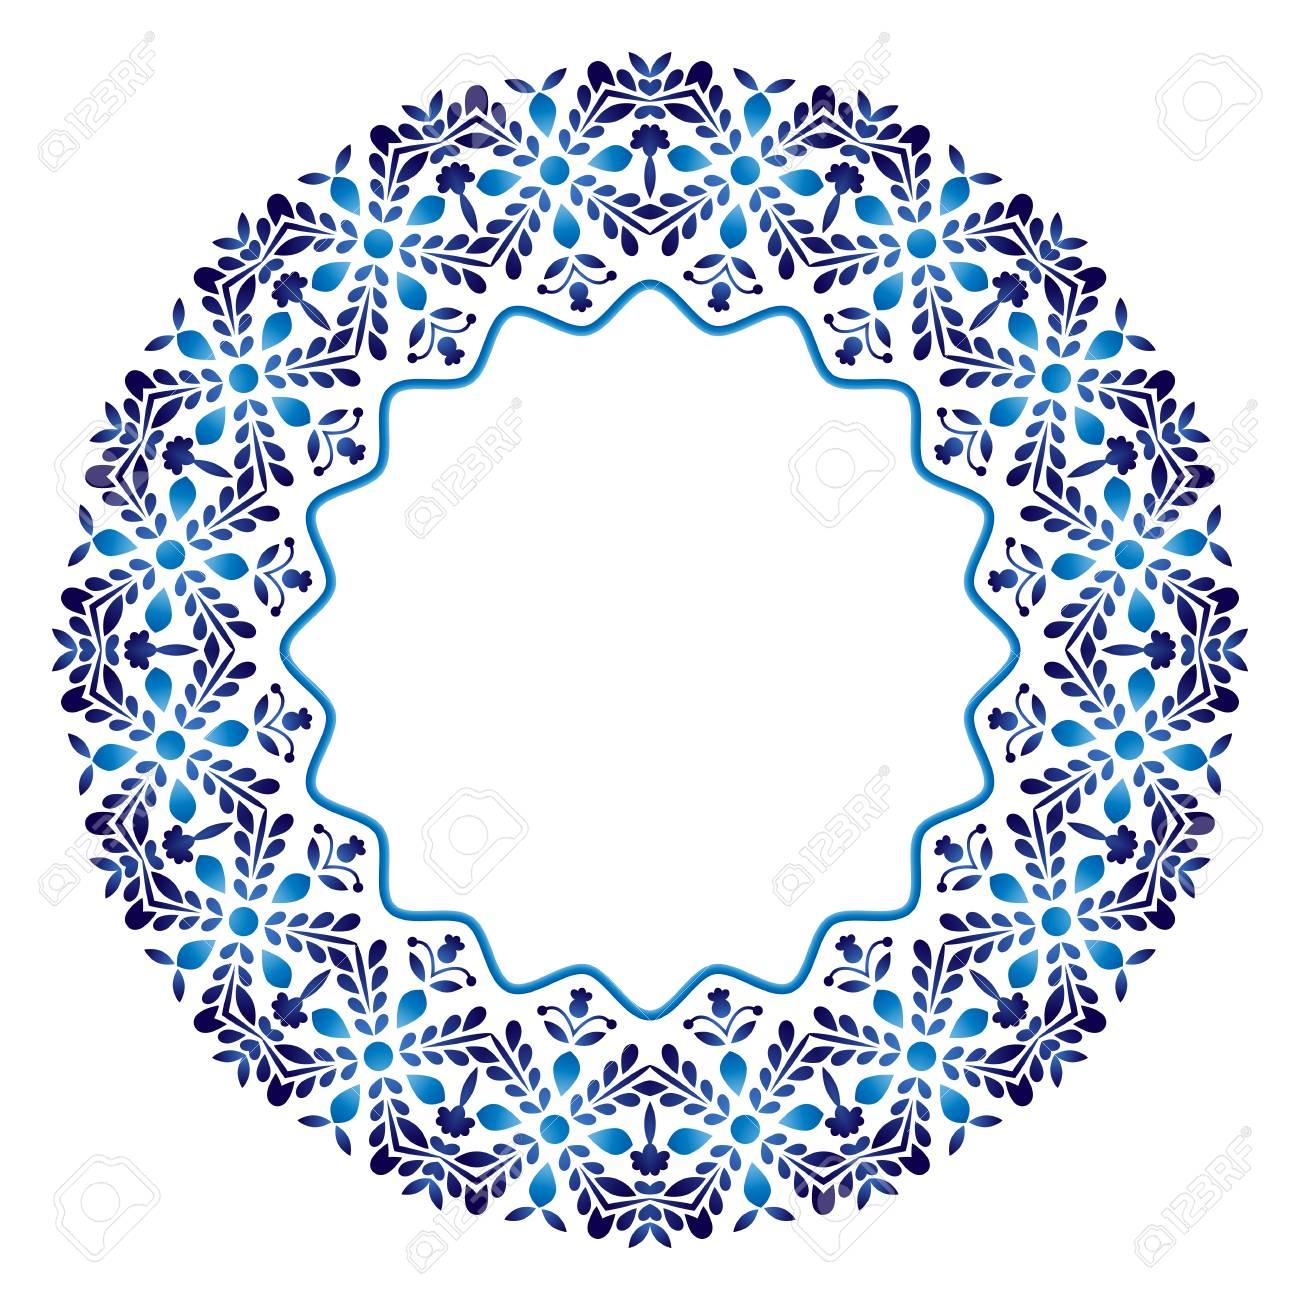 decorative round ornament ceramic tile pattern pattern for